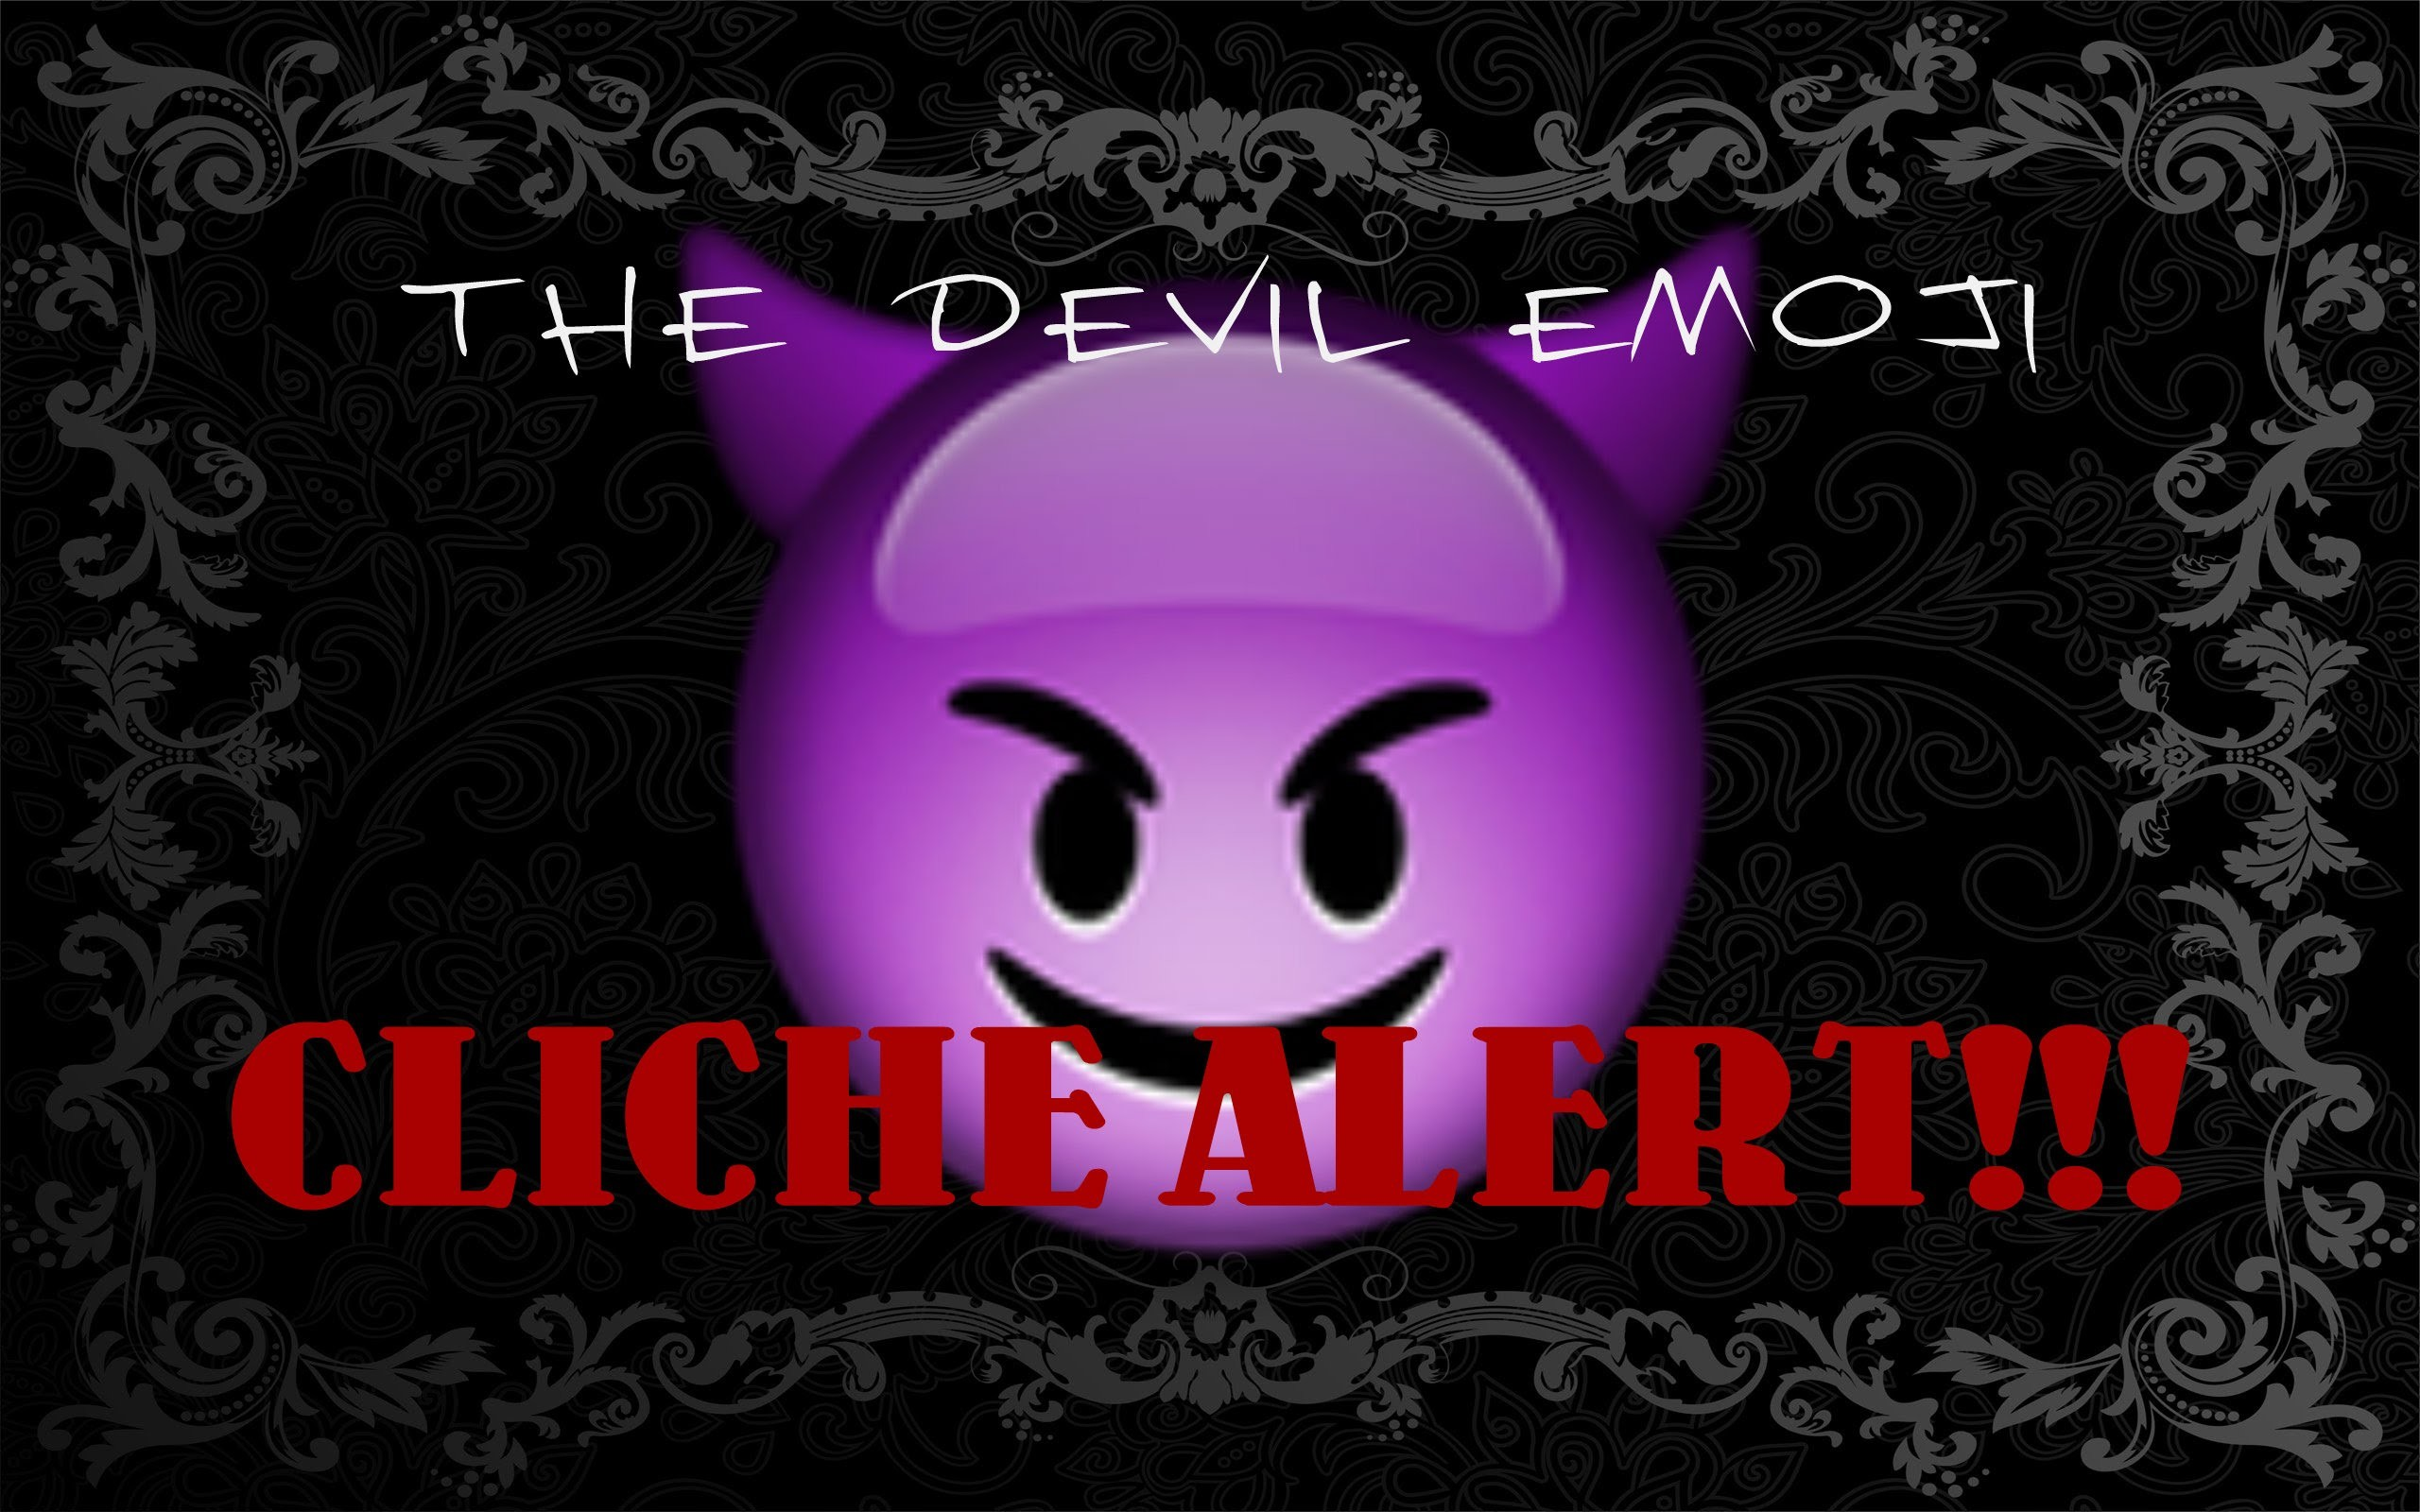 Emoji Fashion Purple Devil, Fire, and 100 Emojis, With Black Backgroun